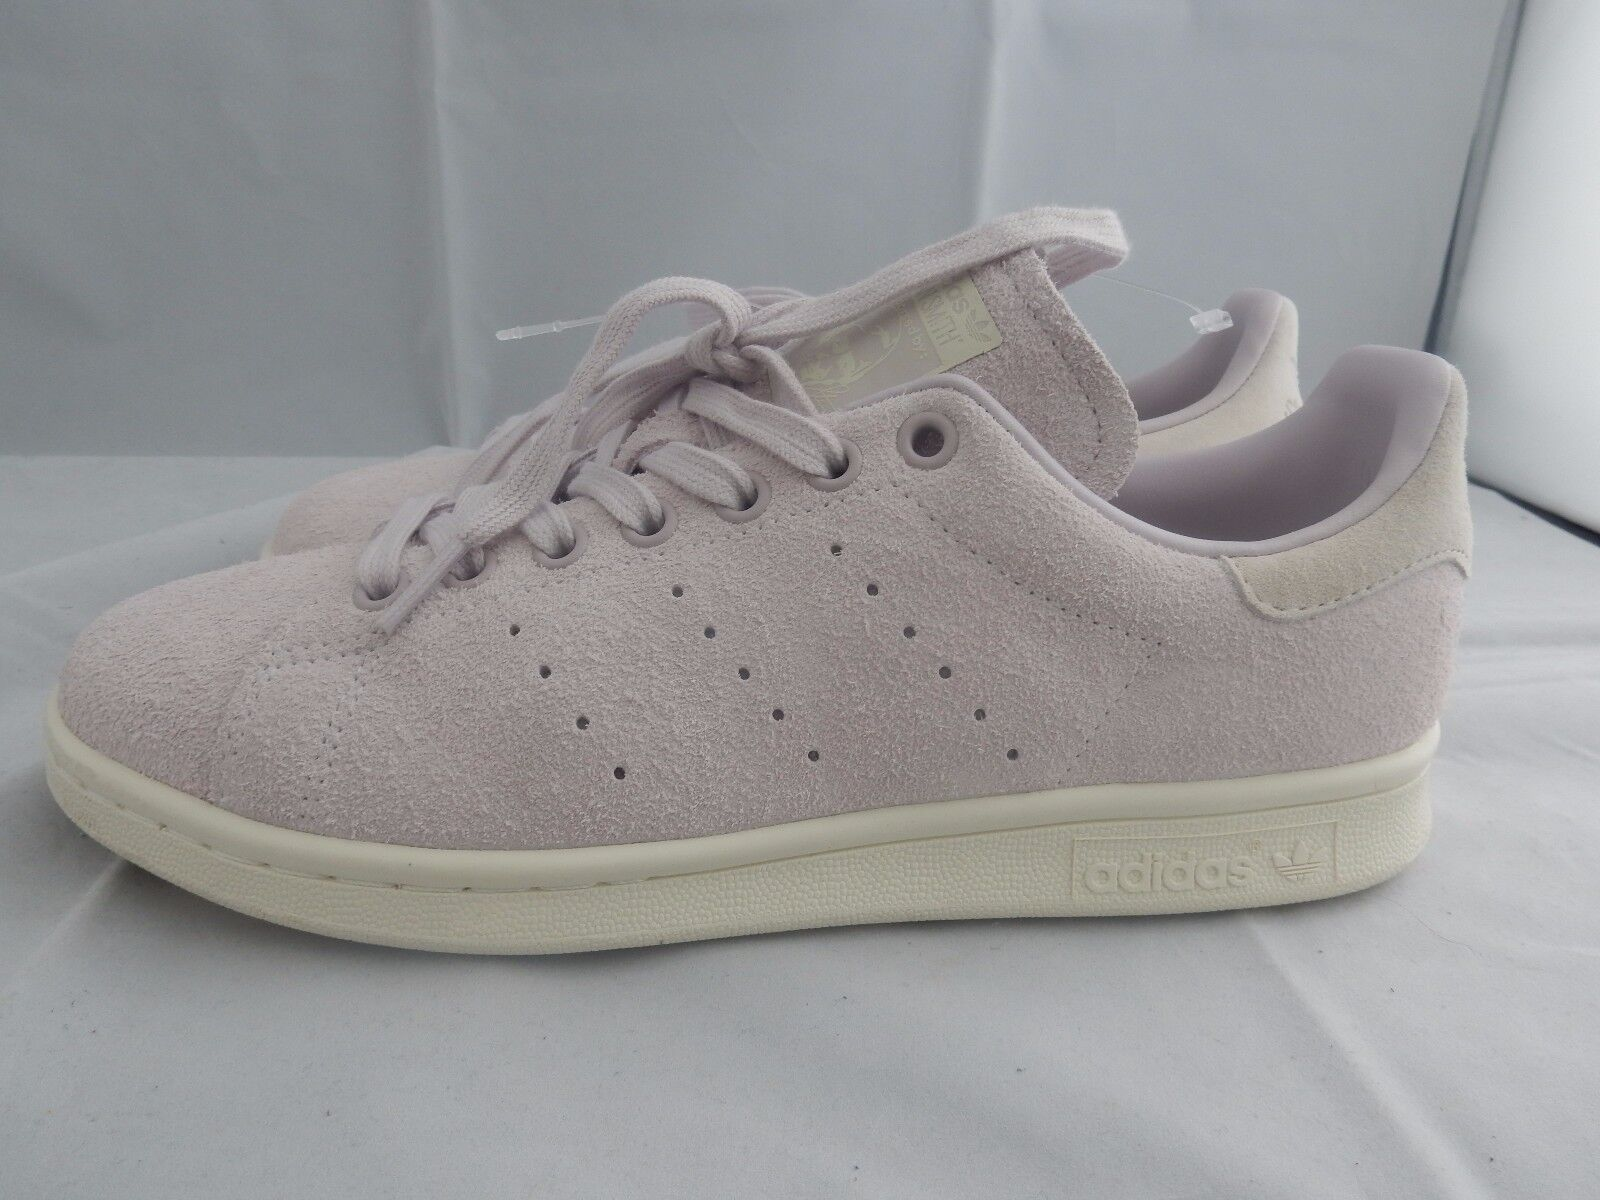 Adidas mujer Stan Smith #CLEARANCE Lila Zapatillas para mujer Adidas nos 7.5 /3 95f1e8